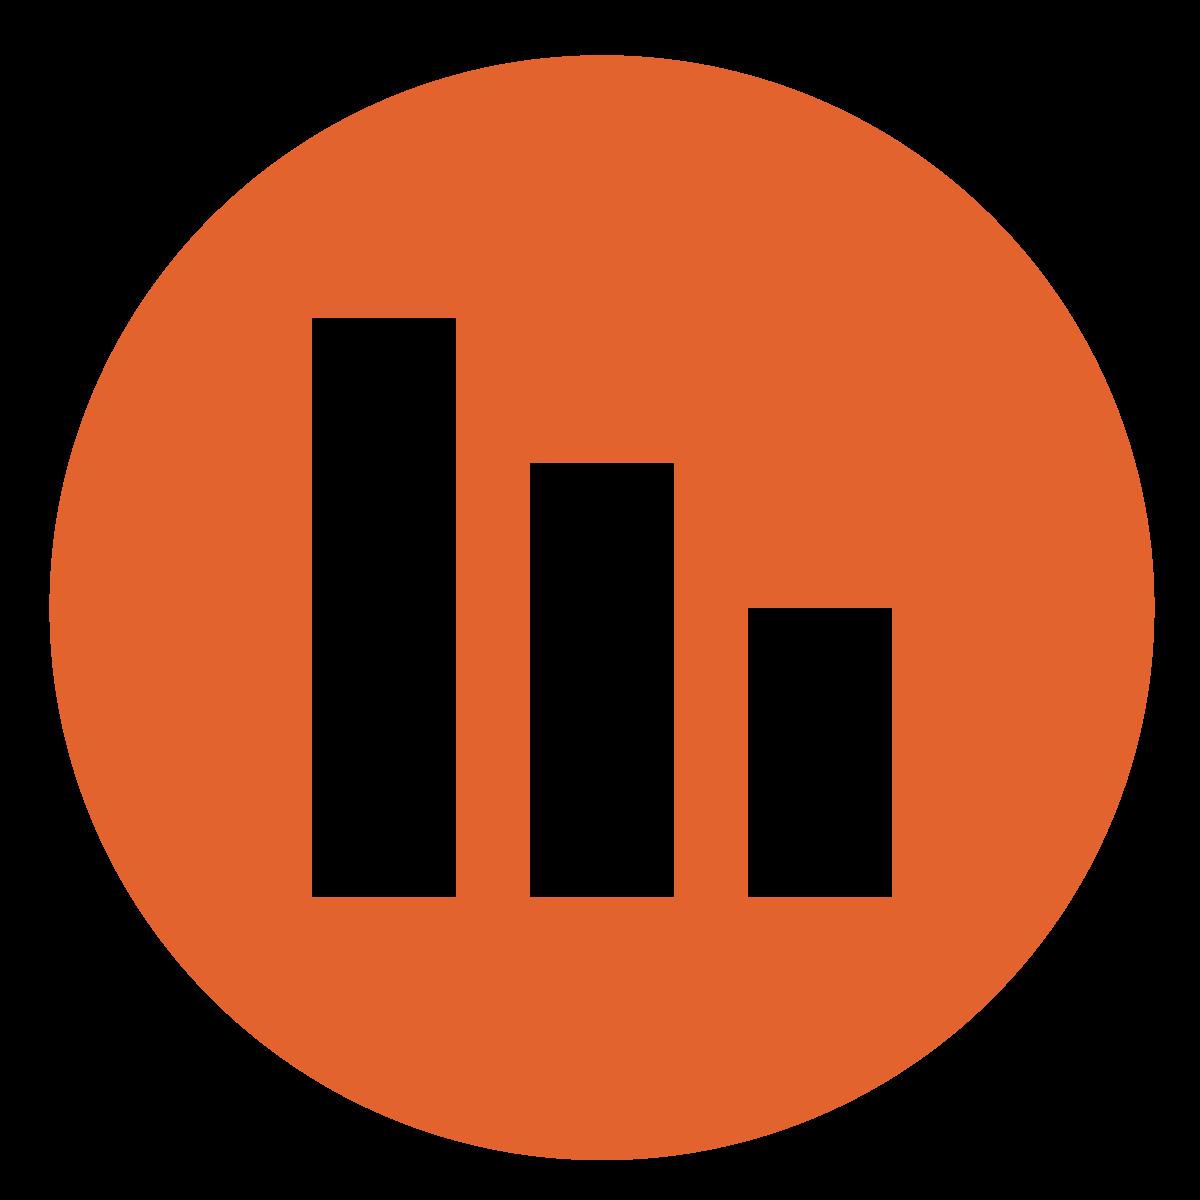 descending bar graphs in a dark orange circle